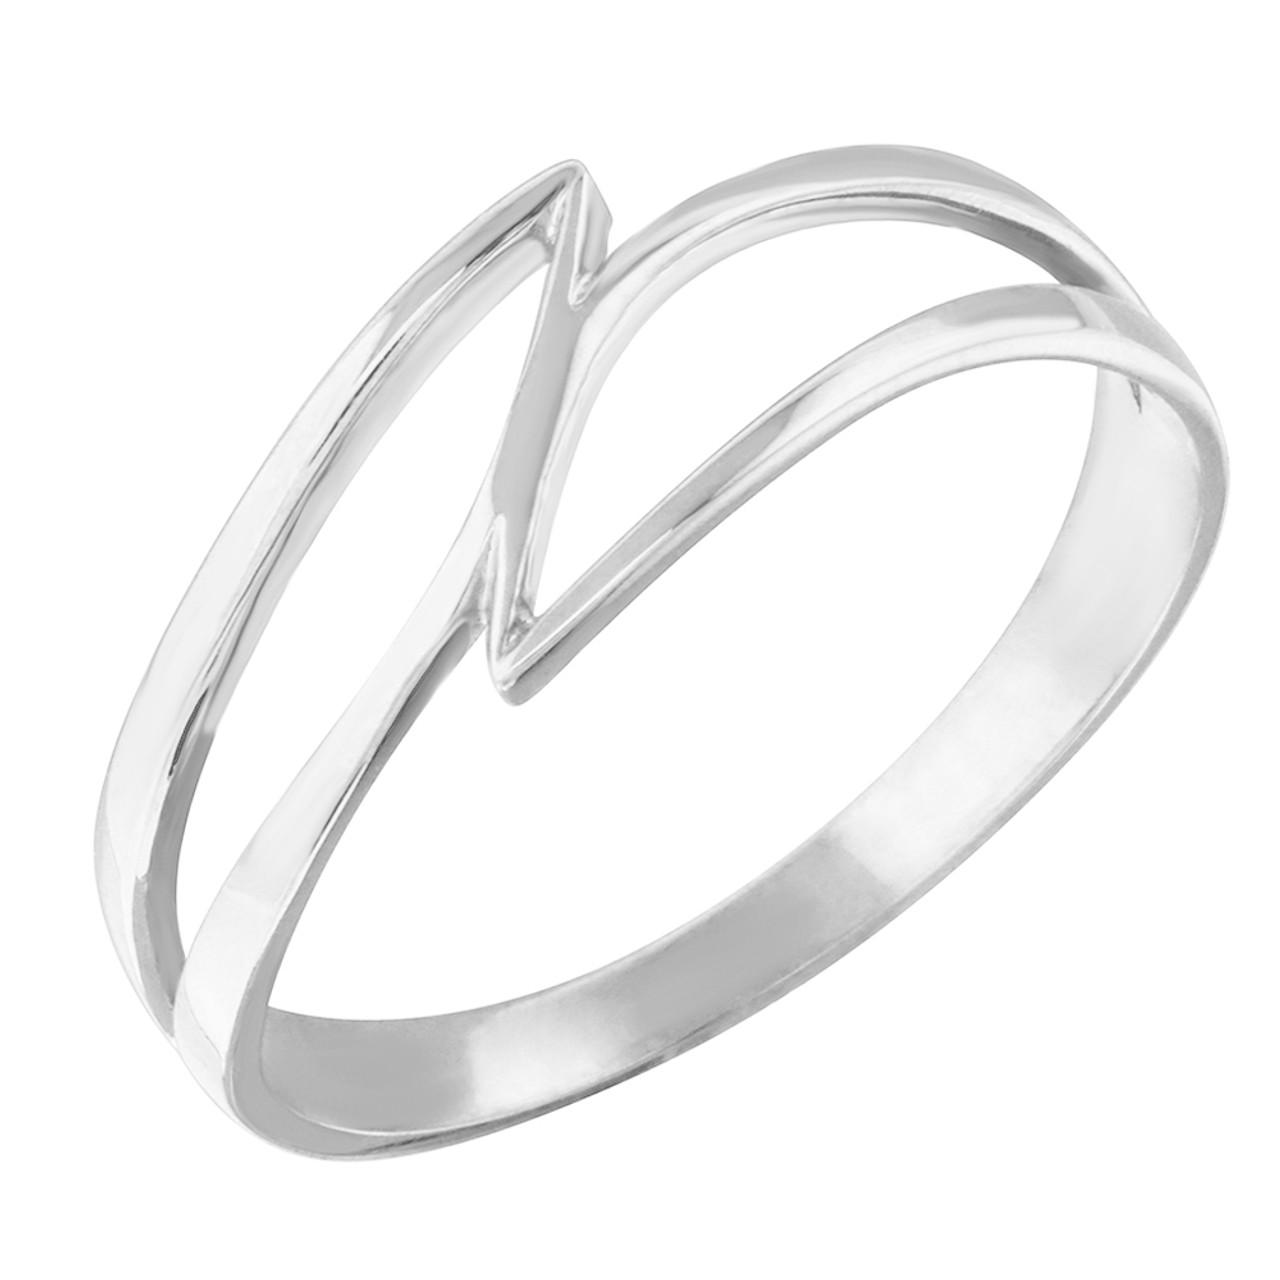 bfa416515 White Gold Double Swish Outline Openwork Minimal Women's Ring